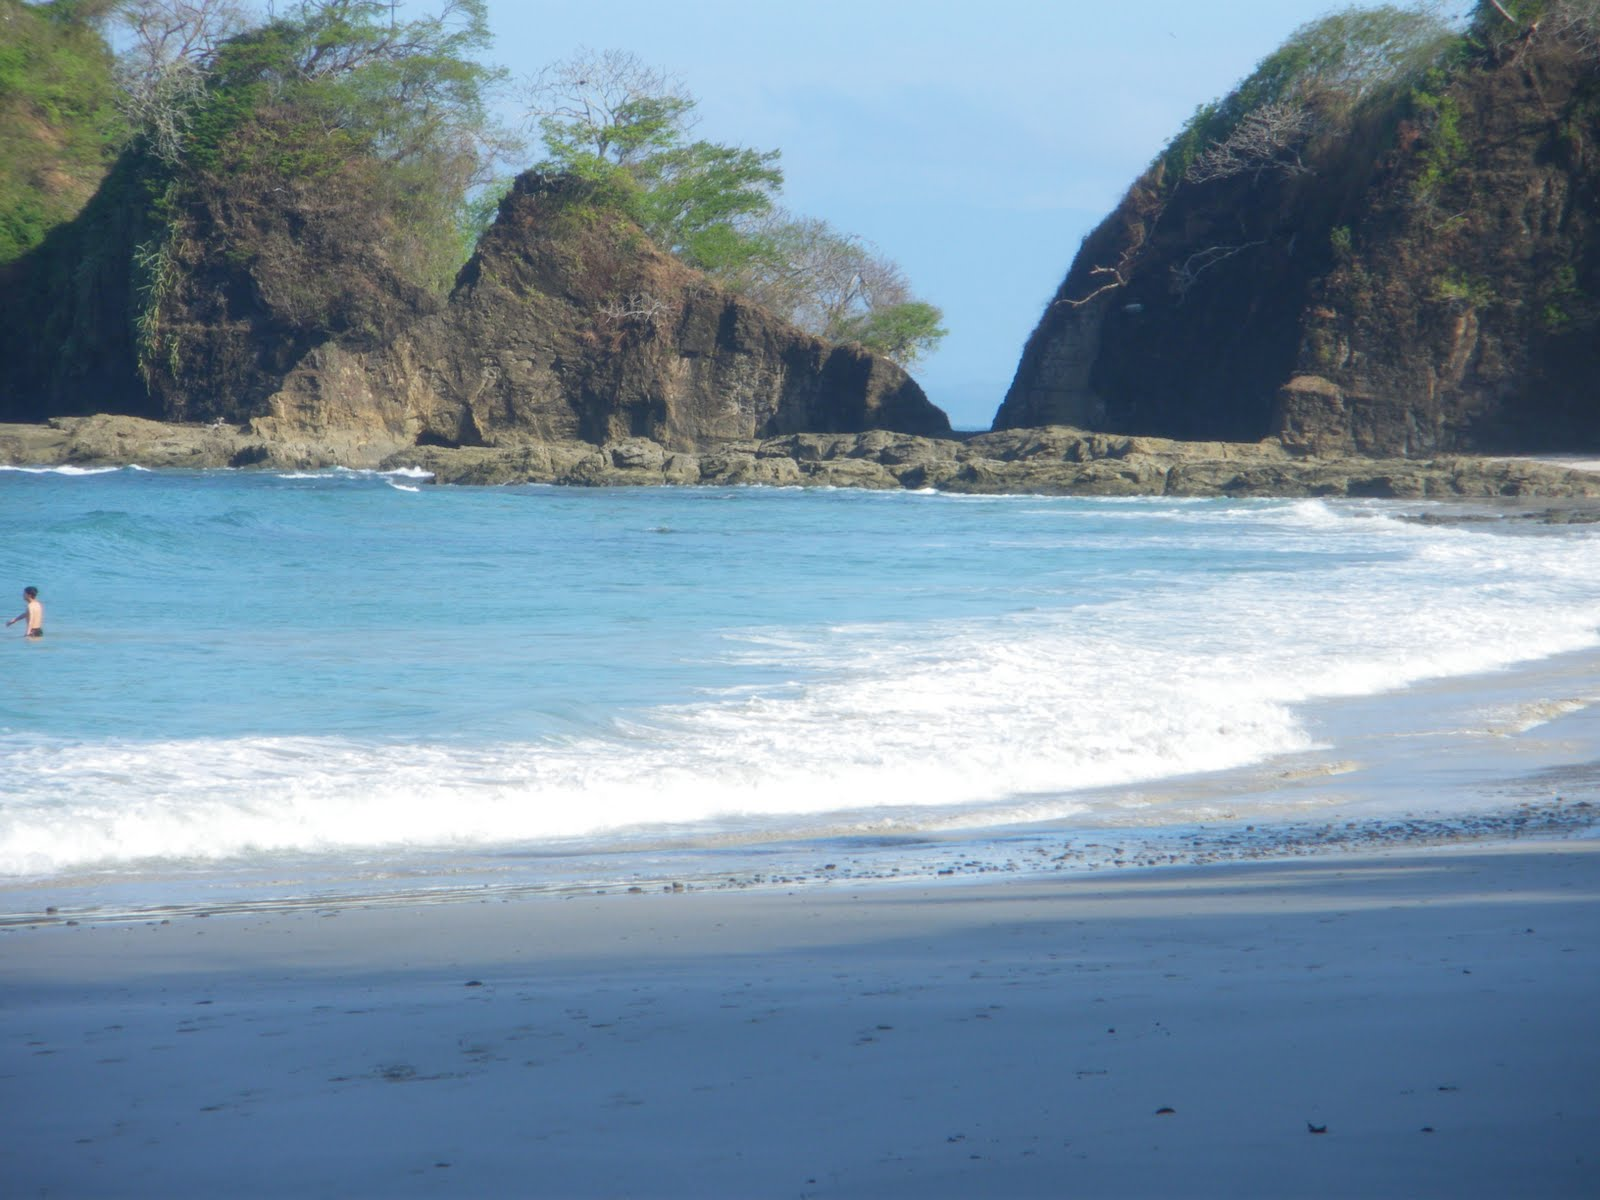 Rauhala Ramblers Leon Beach Pacific Costa Rica